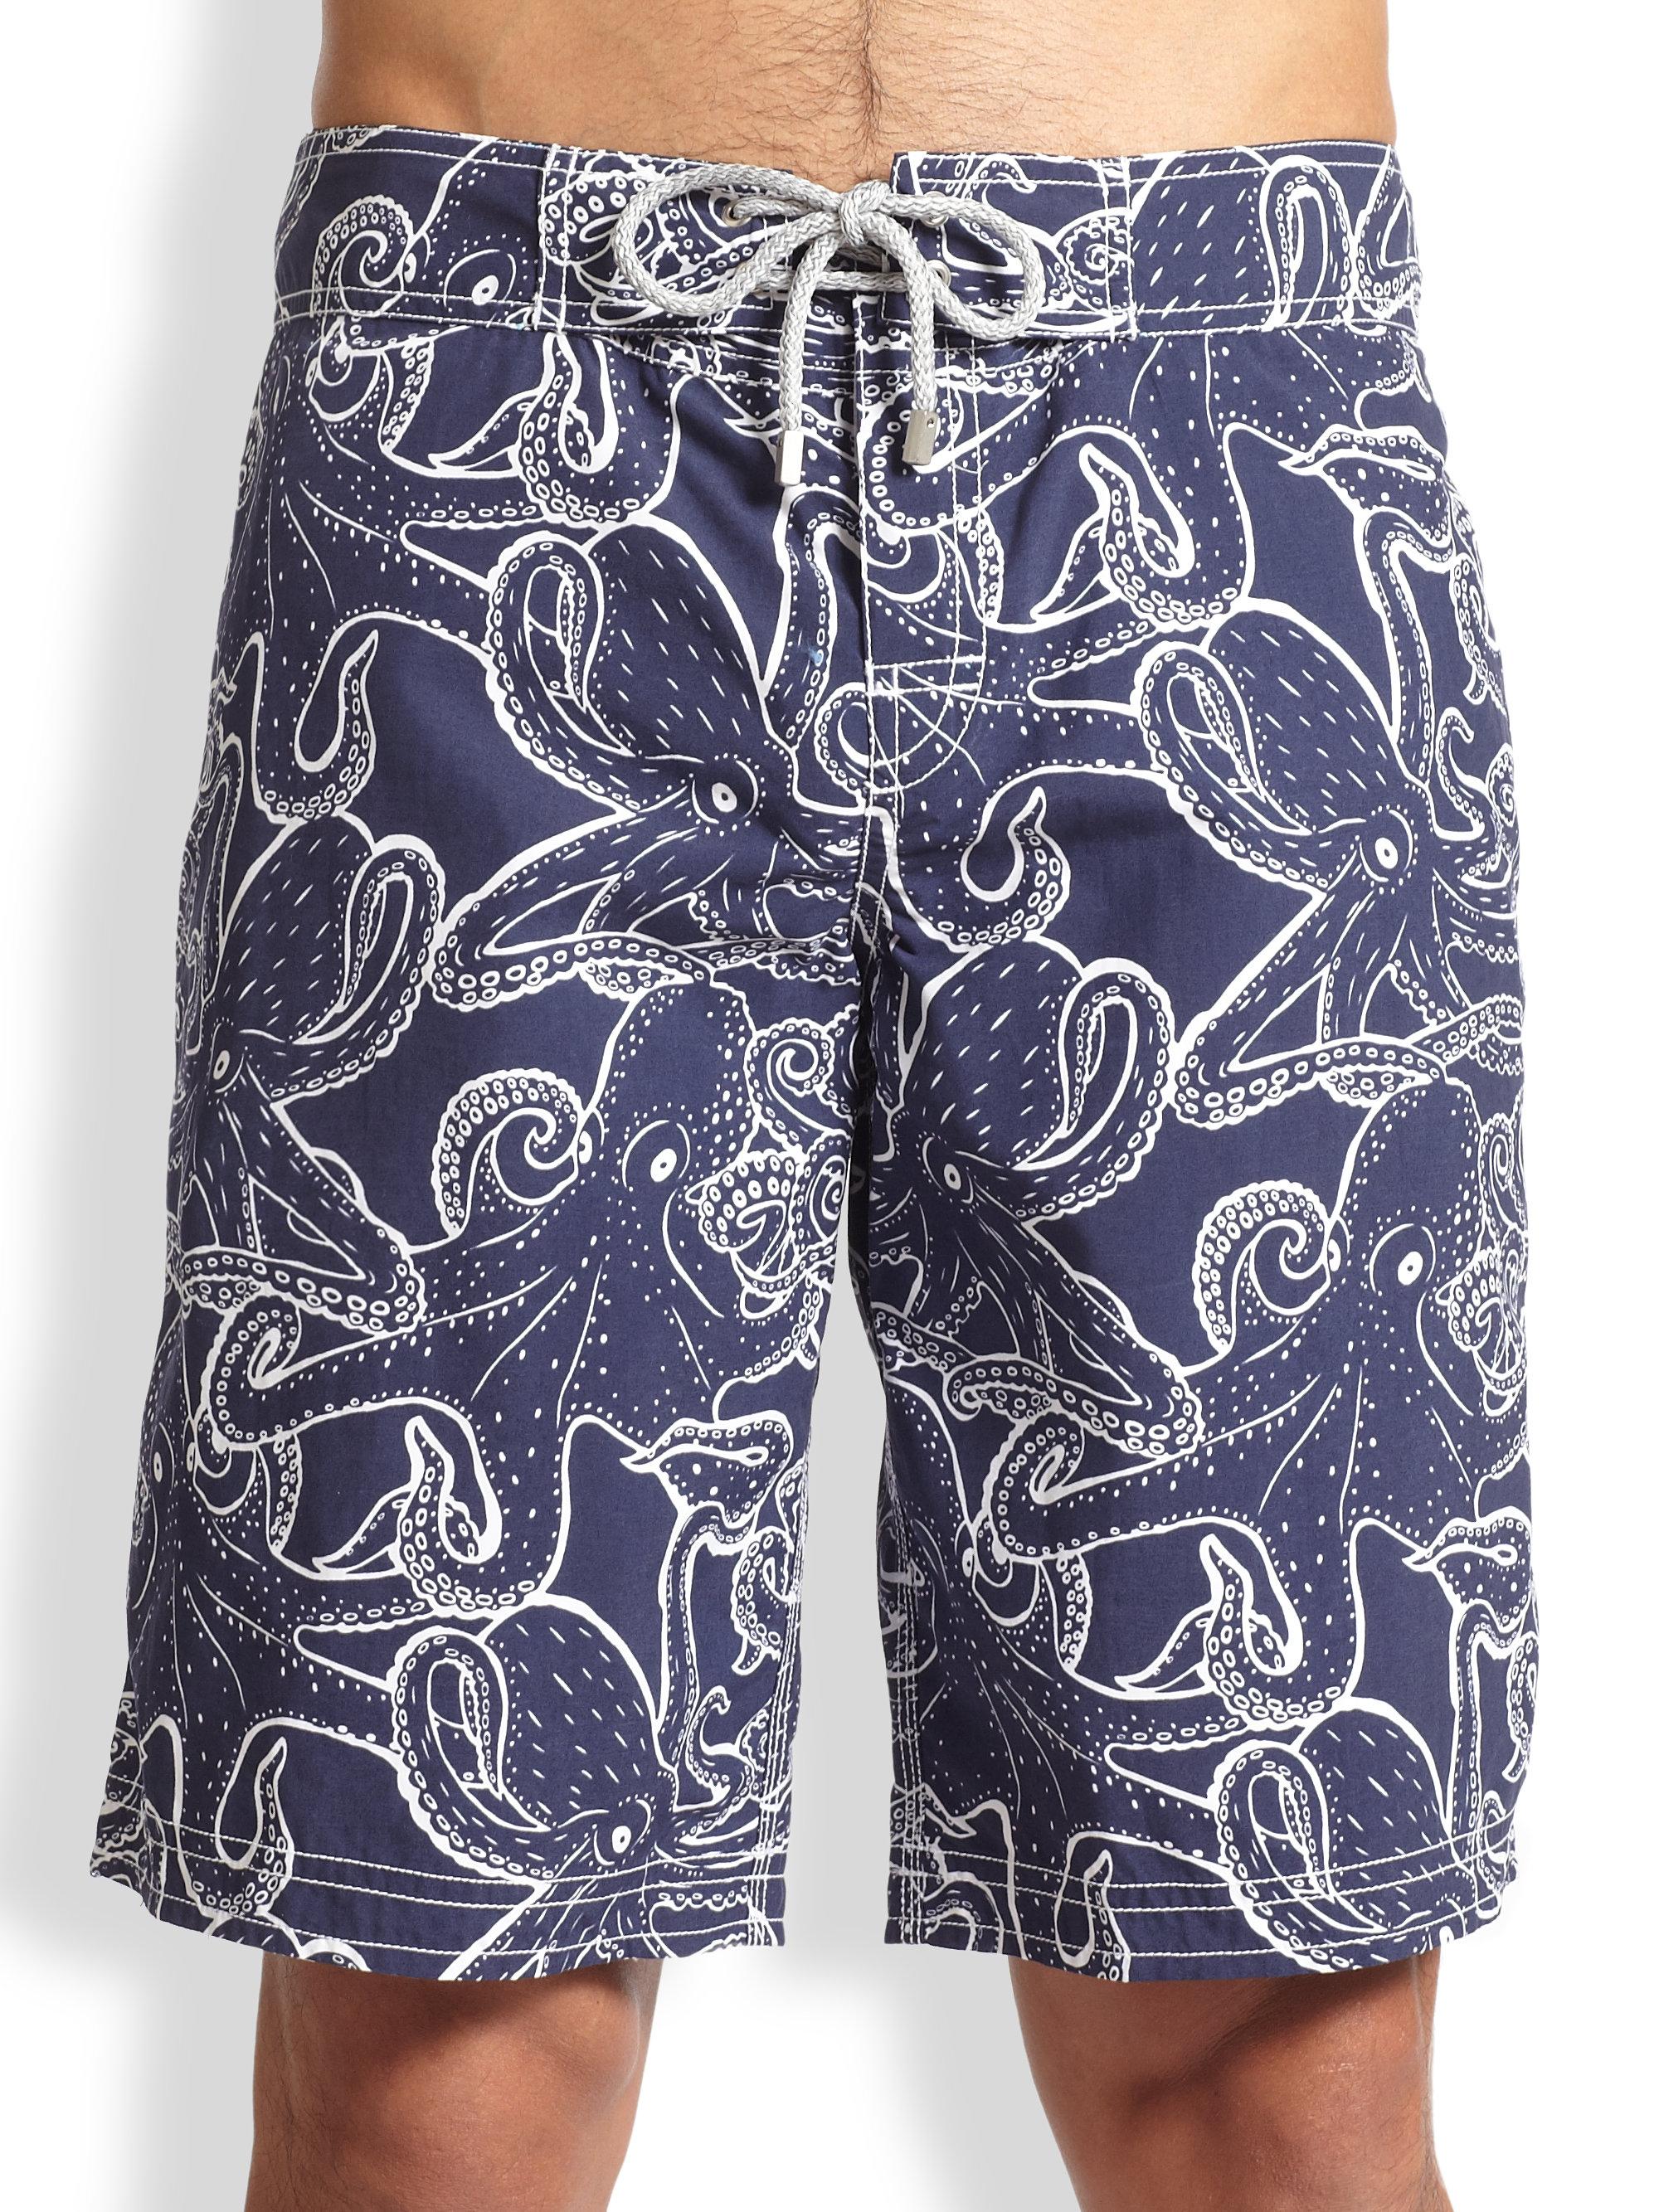 018ac5dfc9376 Vilebrequin Ocean Octopus Swim Trunks in Blue for Men - Lyst